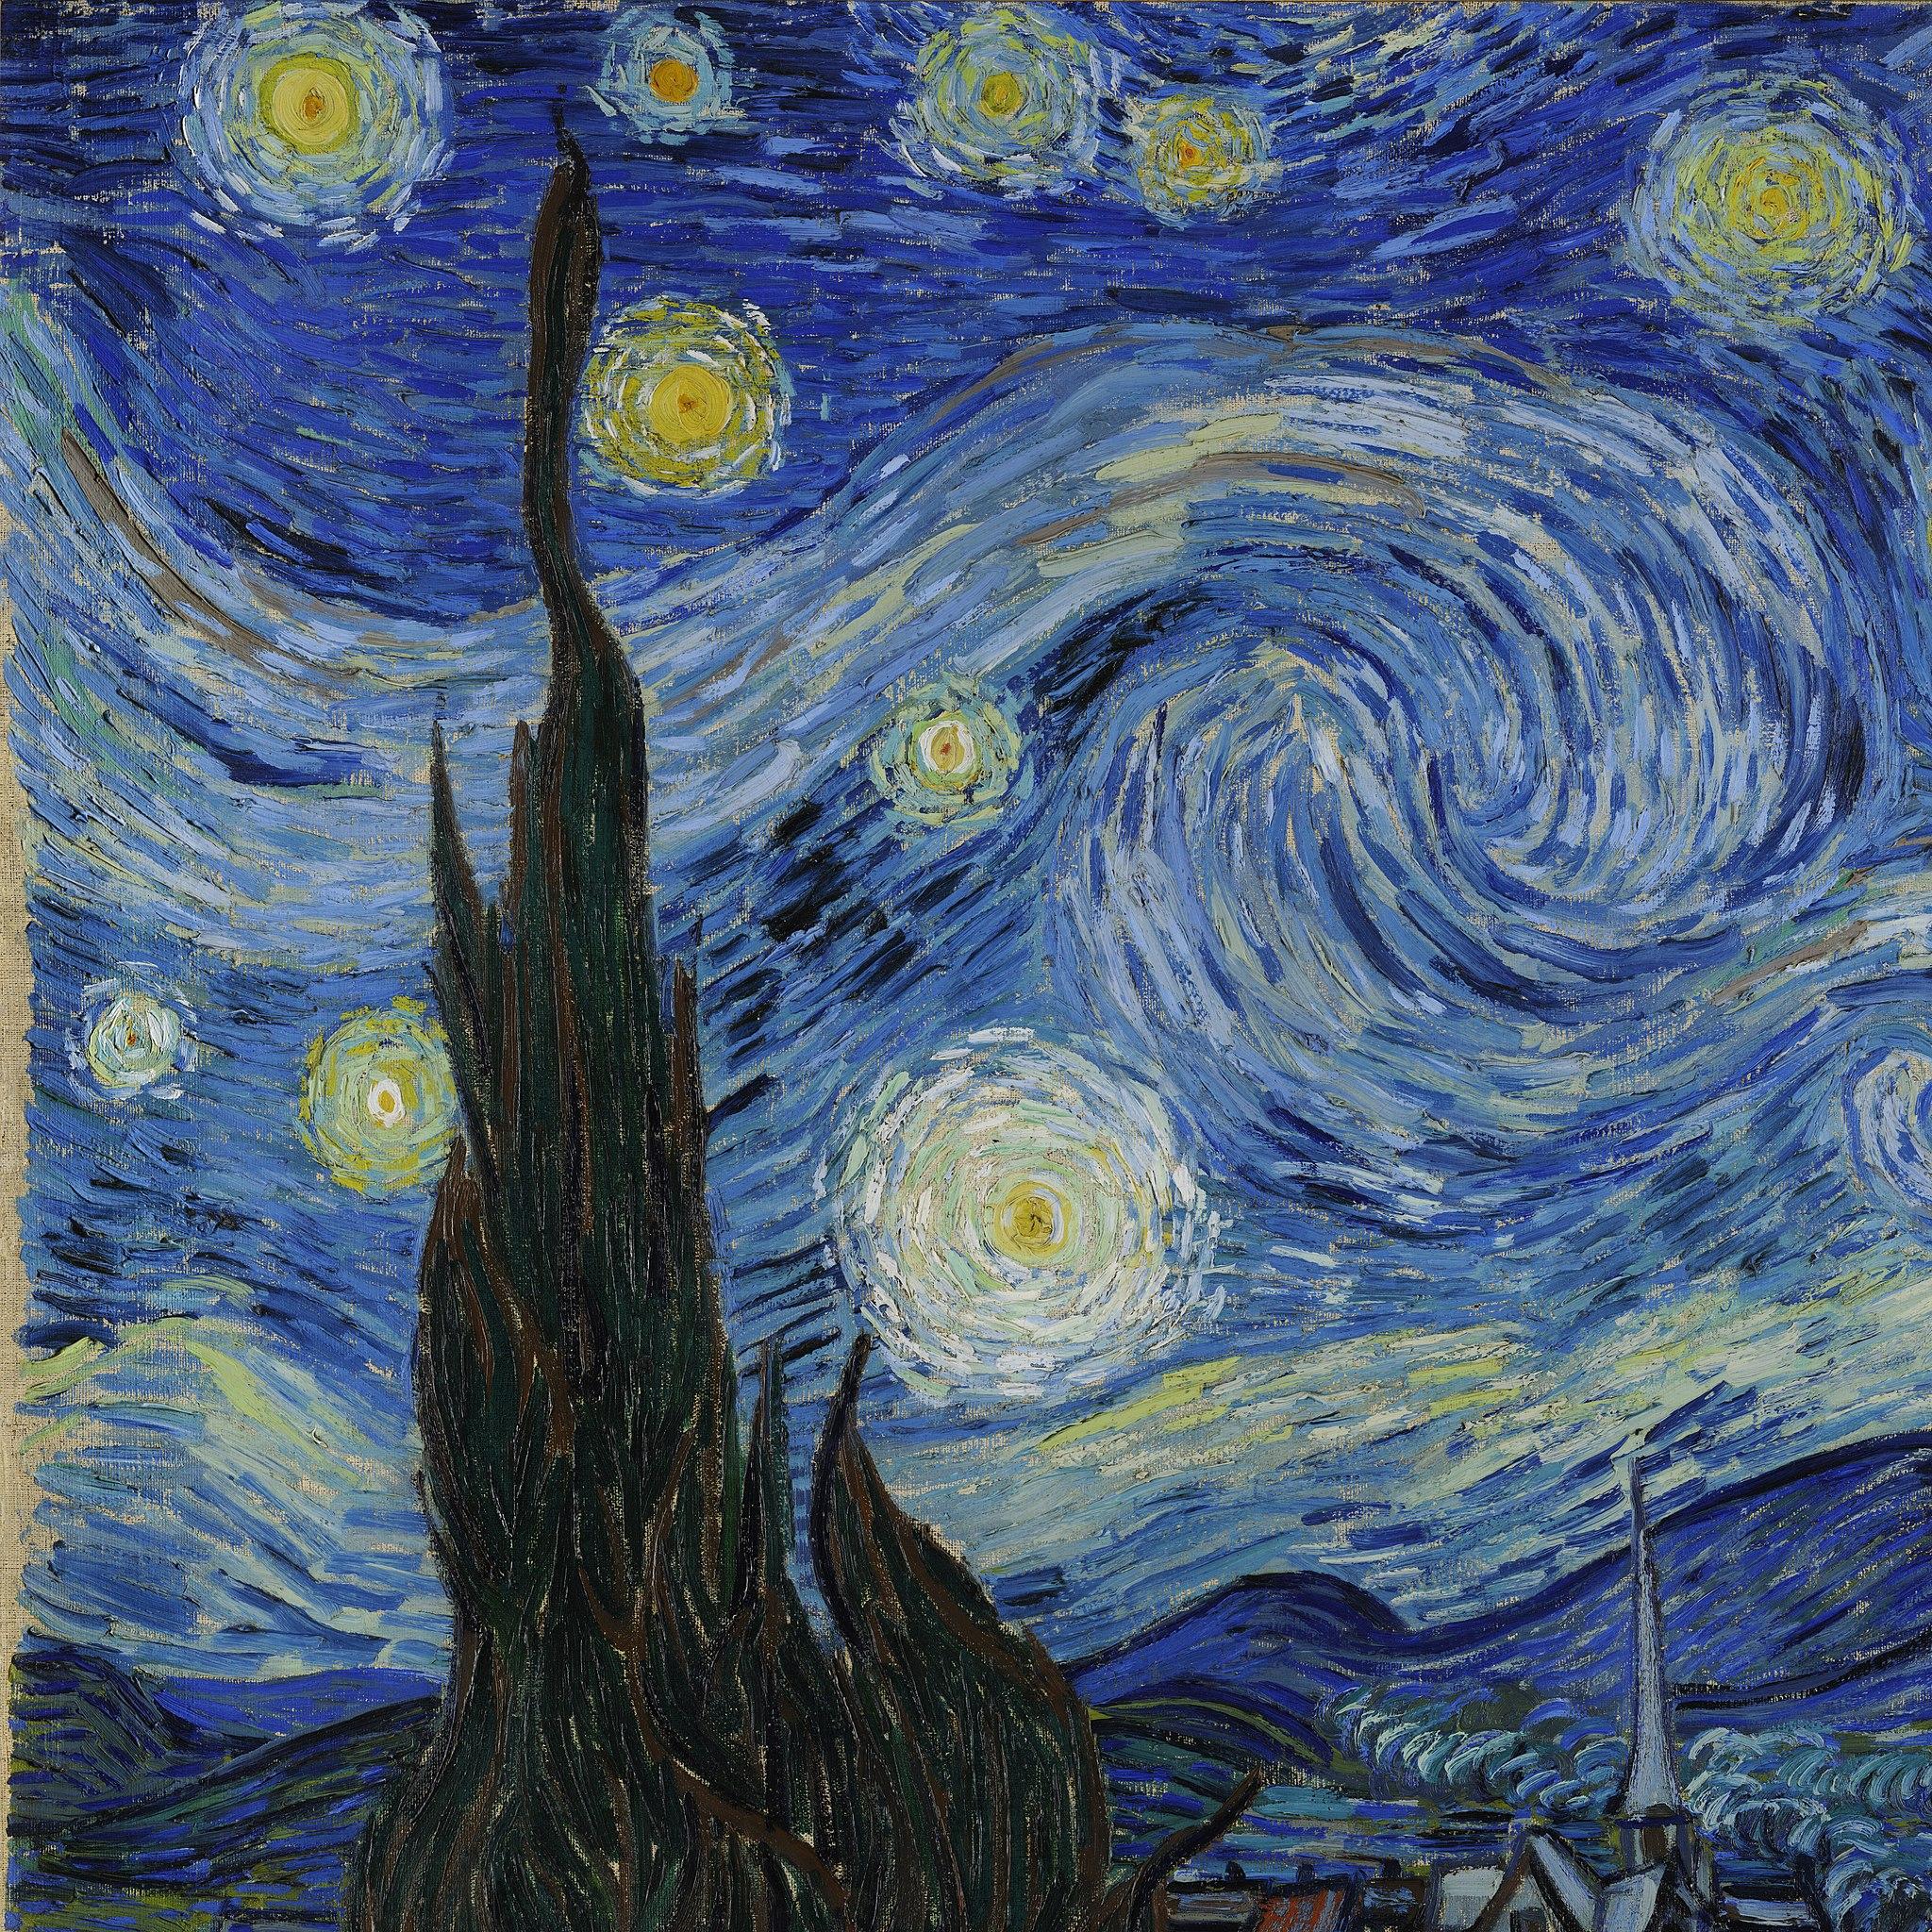 Google Art Project Starry Night